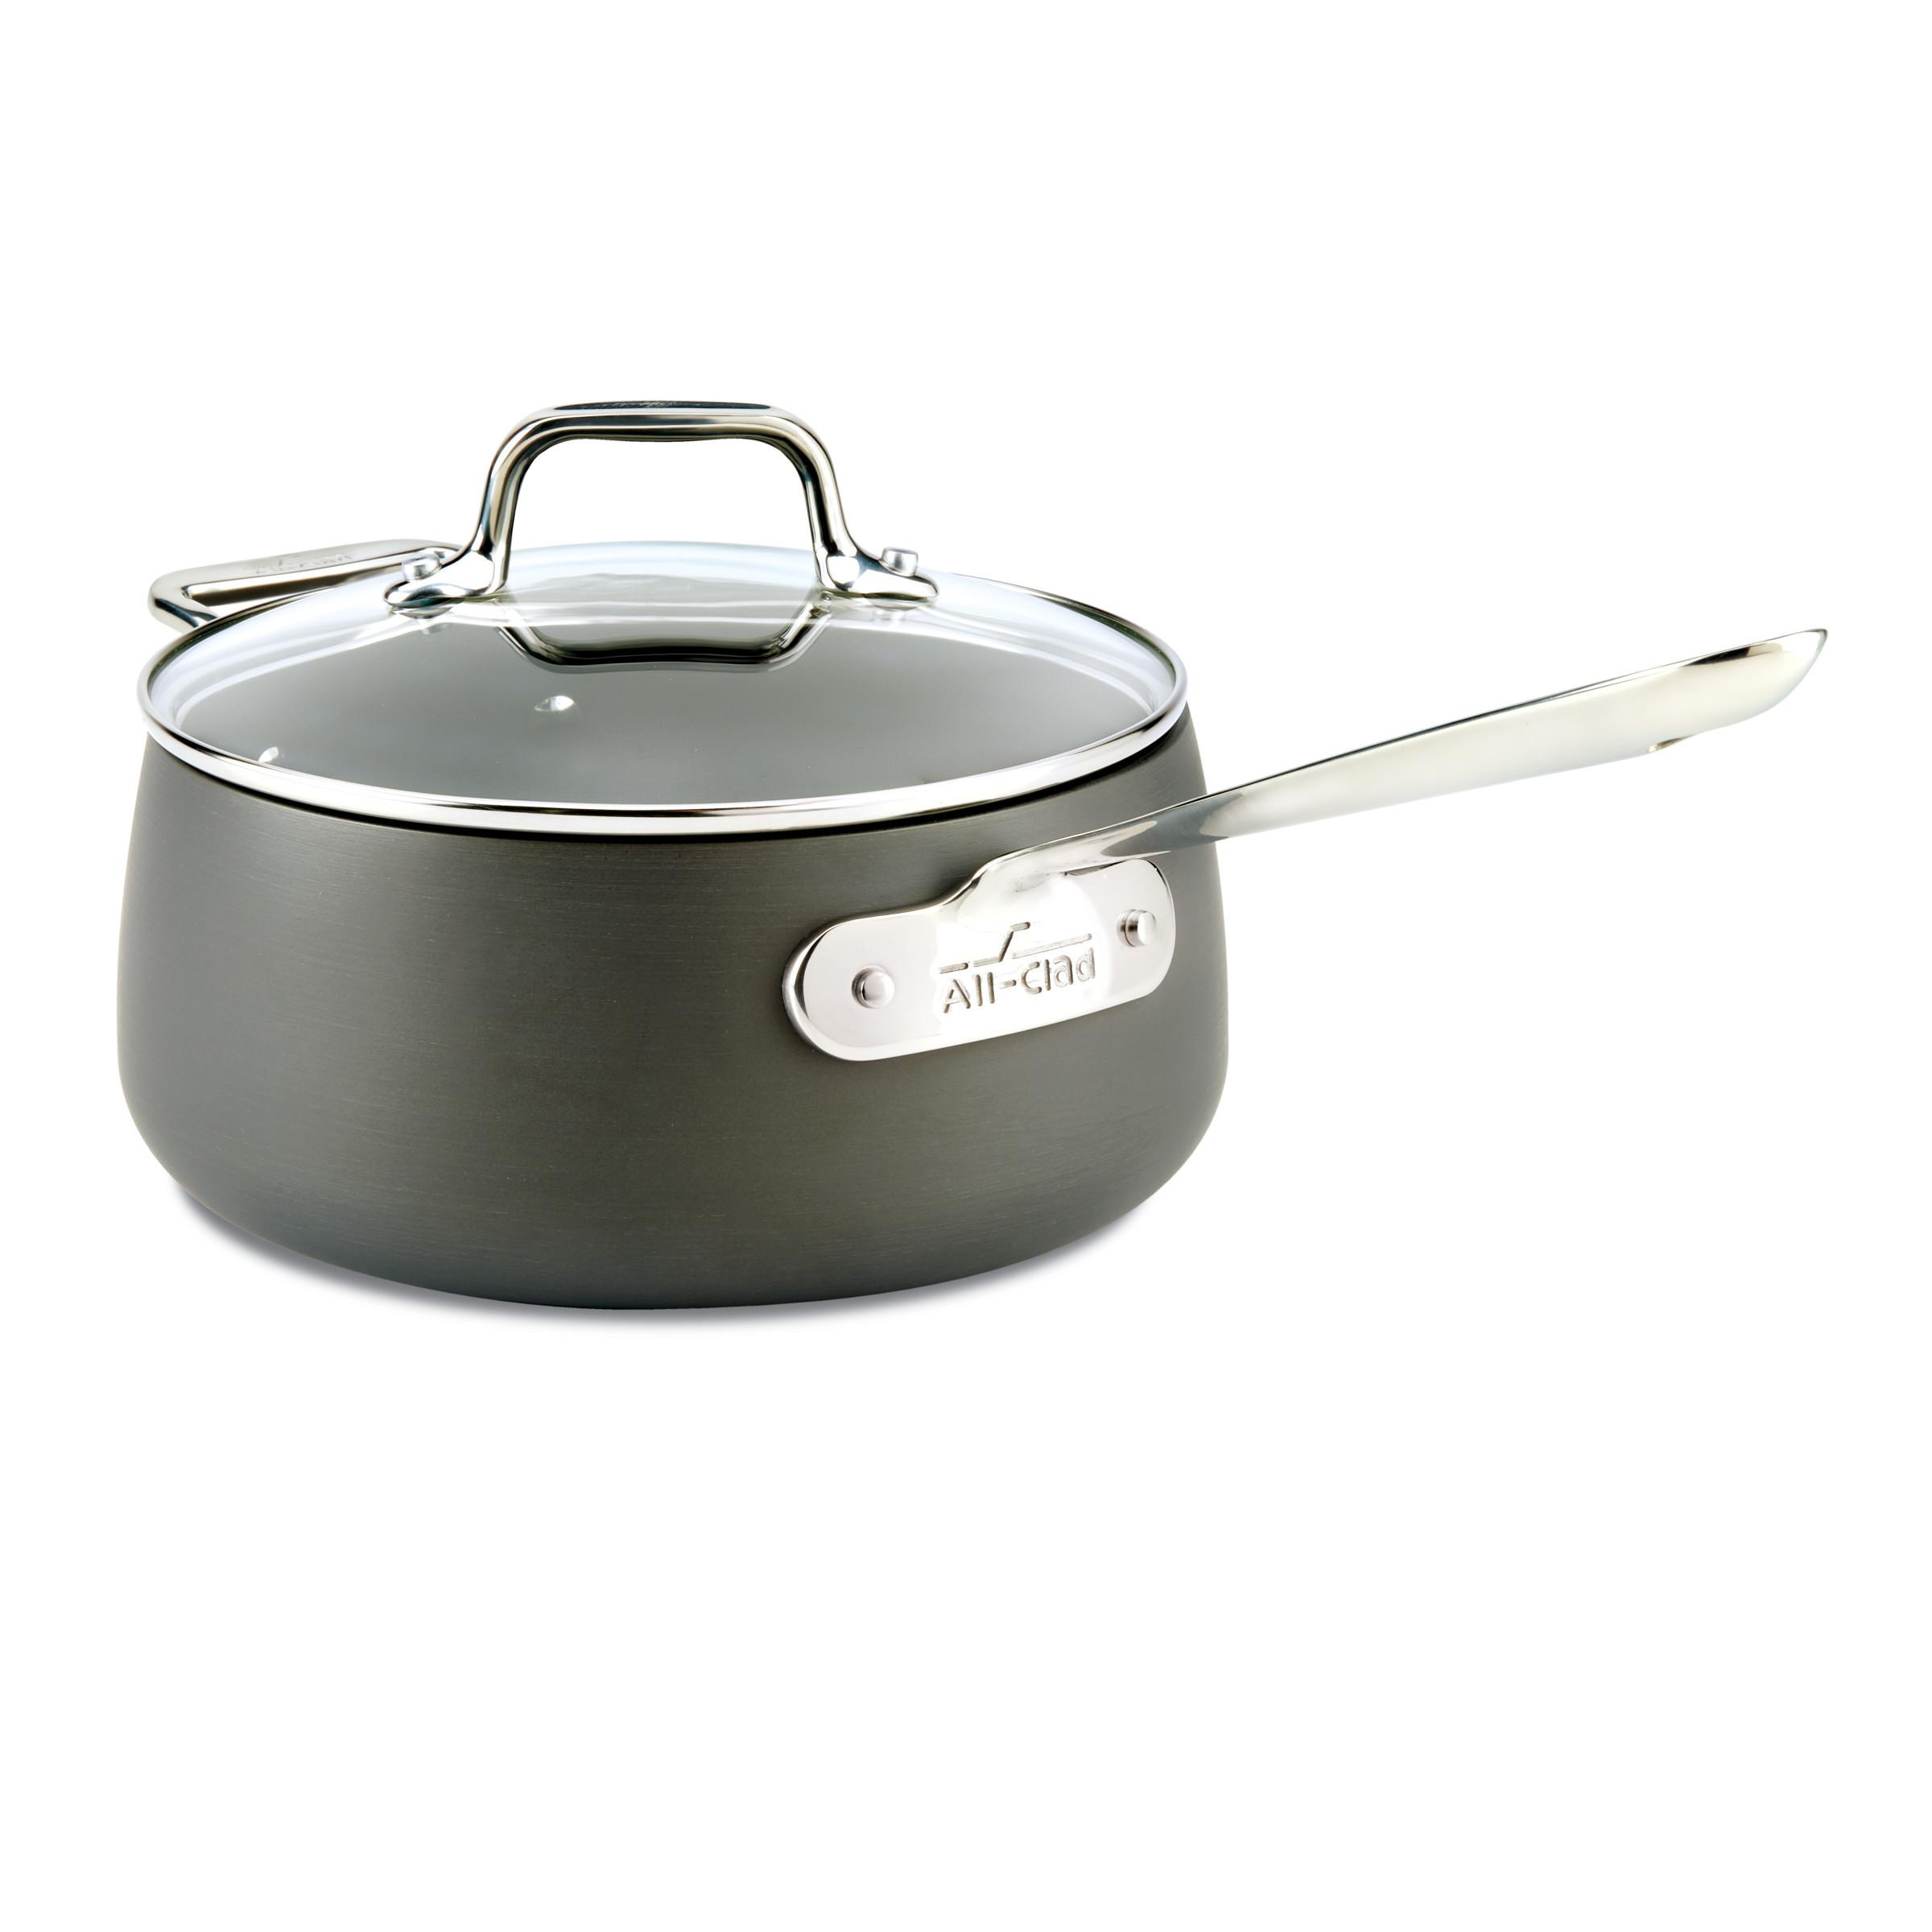 All Clad Hard Anodized Nonstick 3.5 Quart Sauce Pan